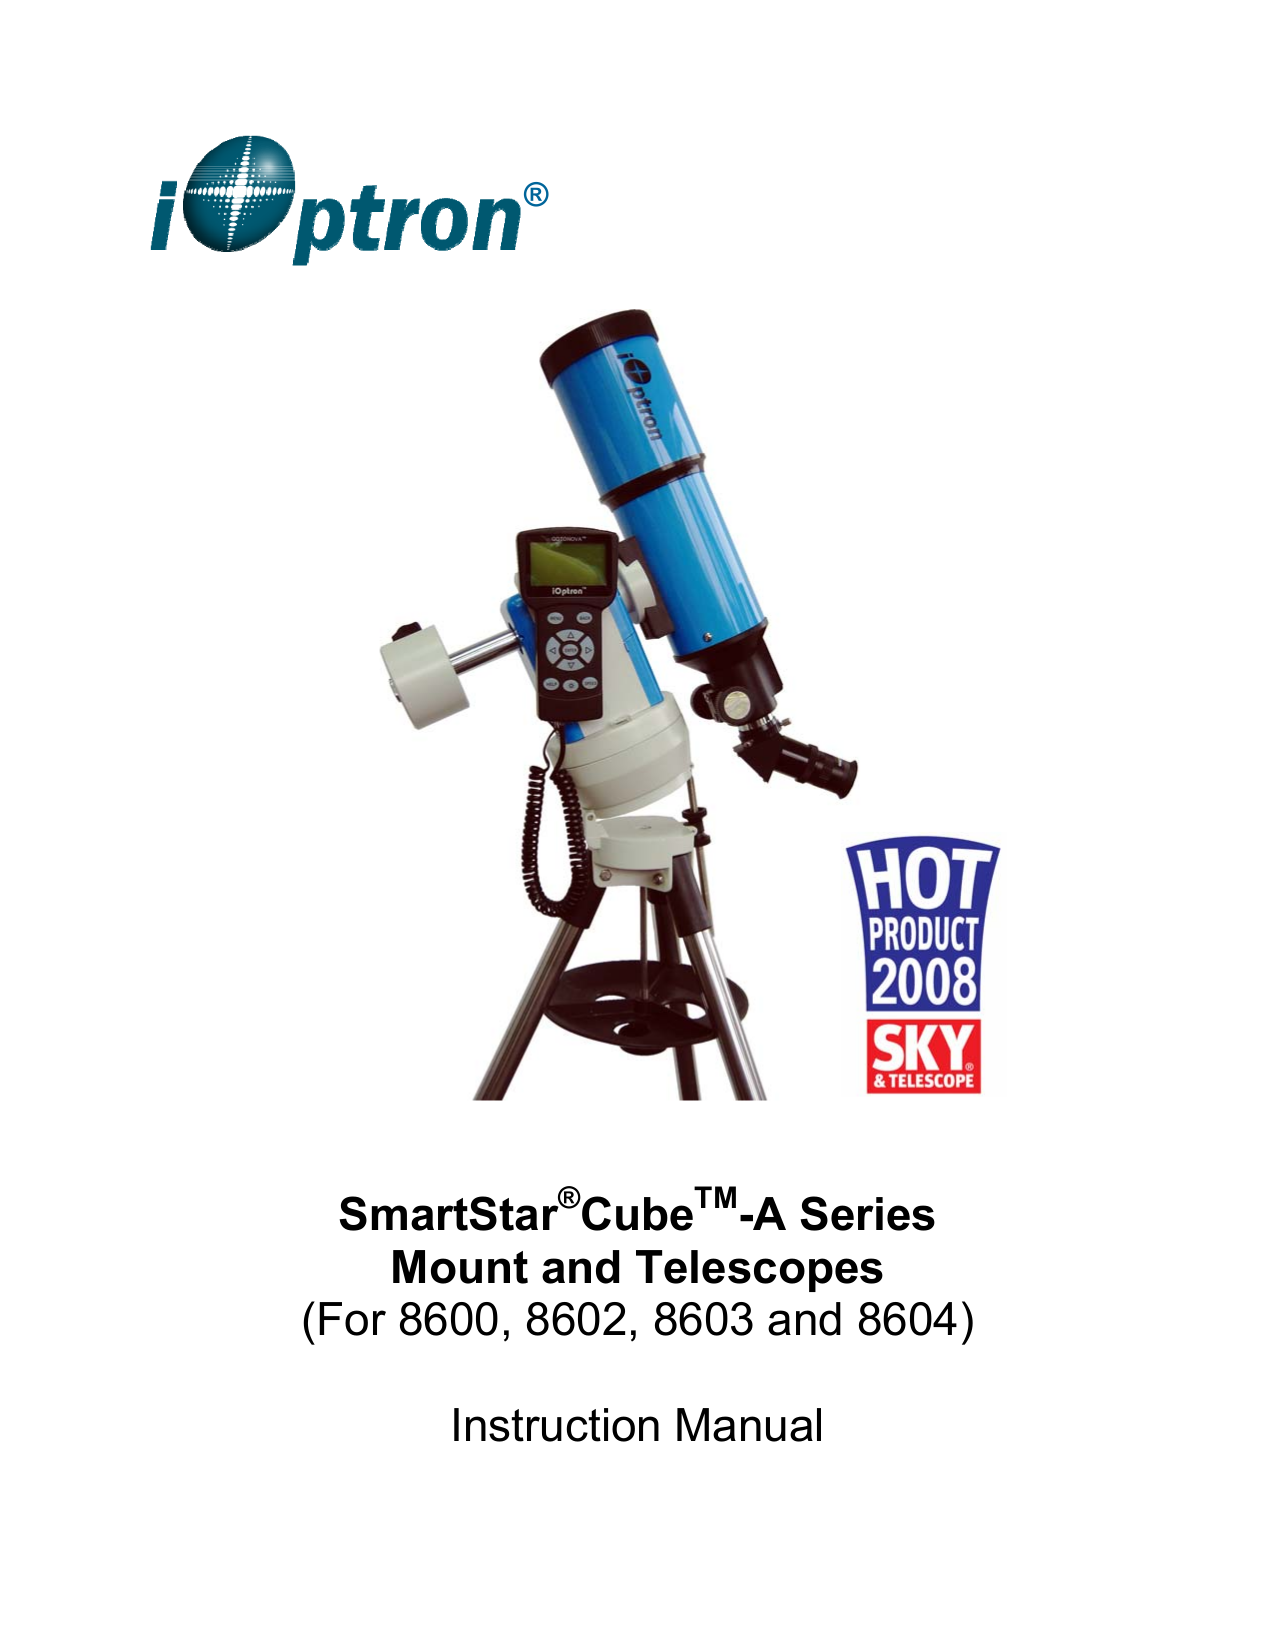 pdf for Ioptron Telescope SmartStar A-MC90 manual